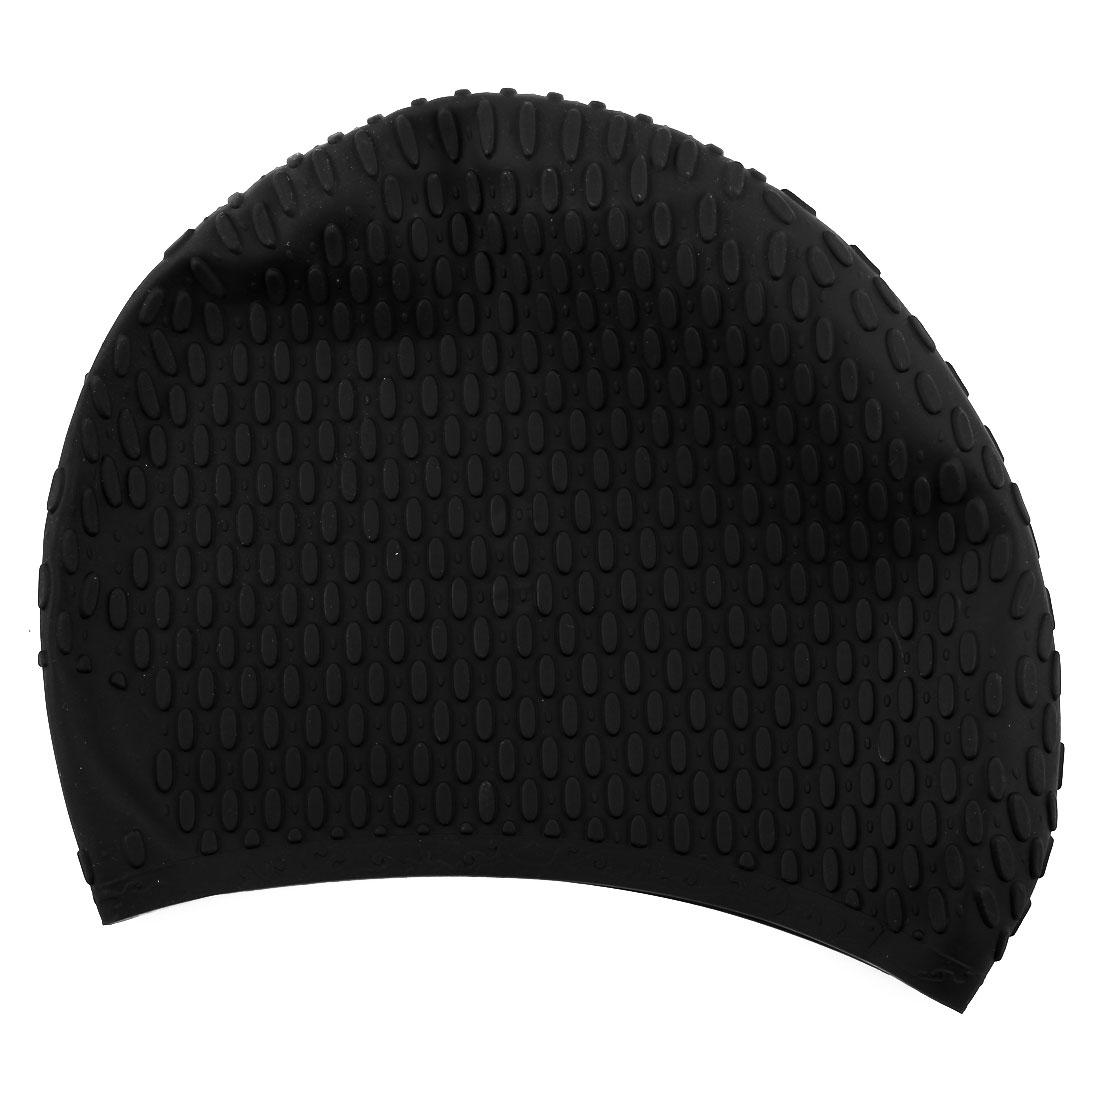 Adult Unisex Silicone Dome Shape Anti-slip Elastic Swimming Cap Underwater Bathing Hat Black